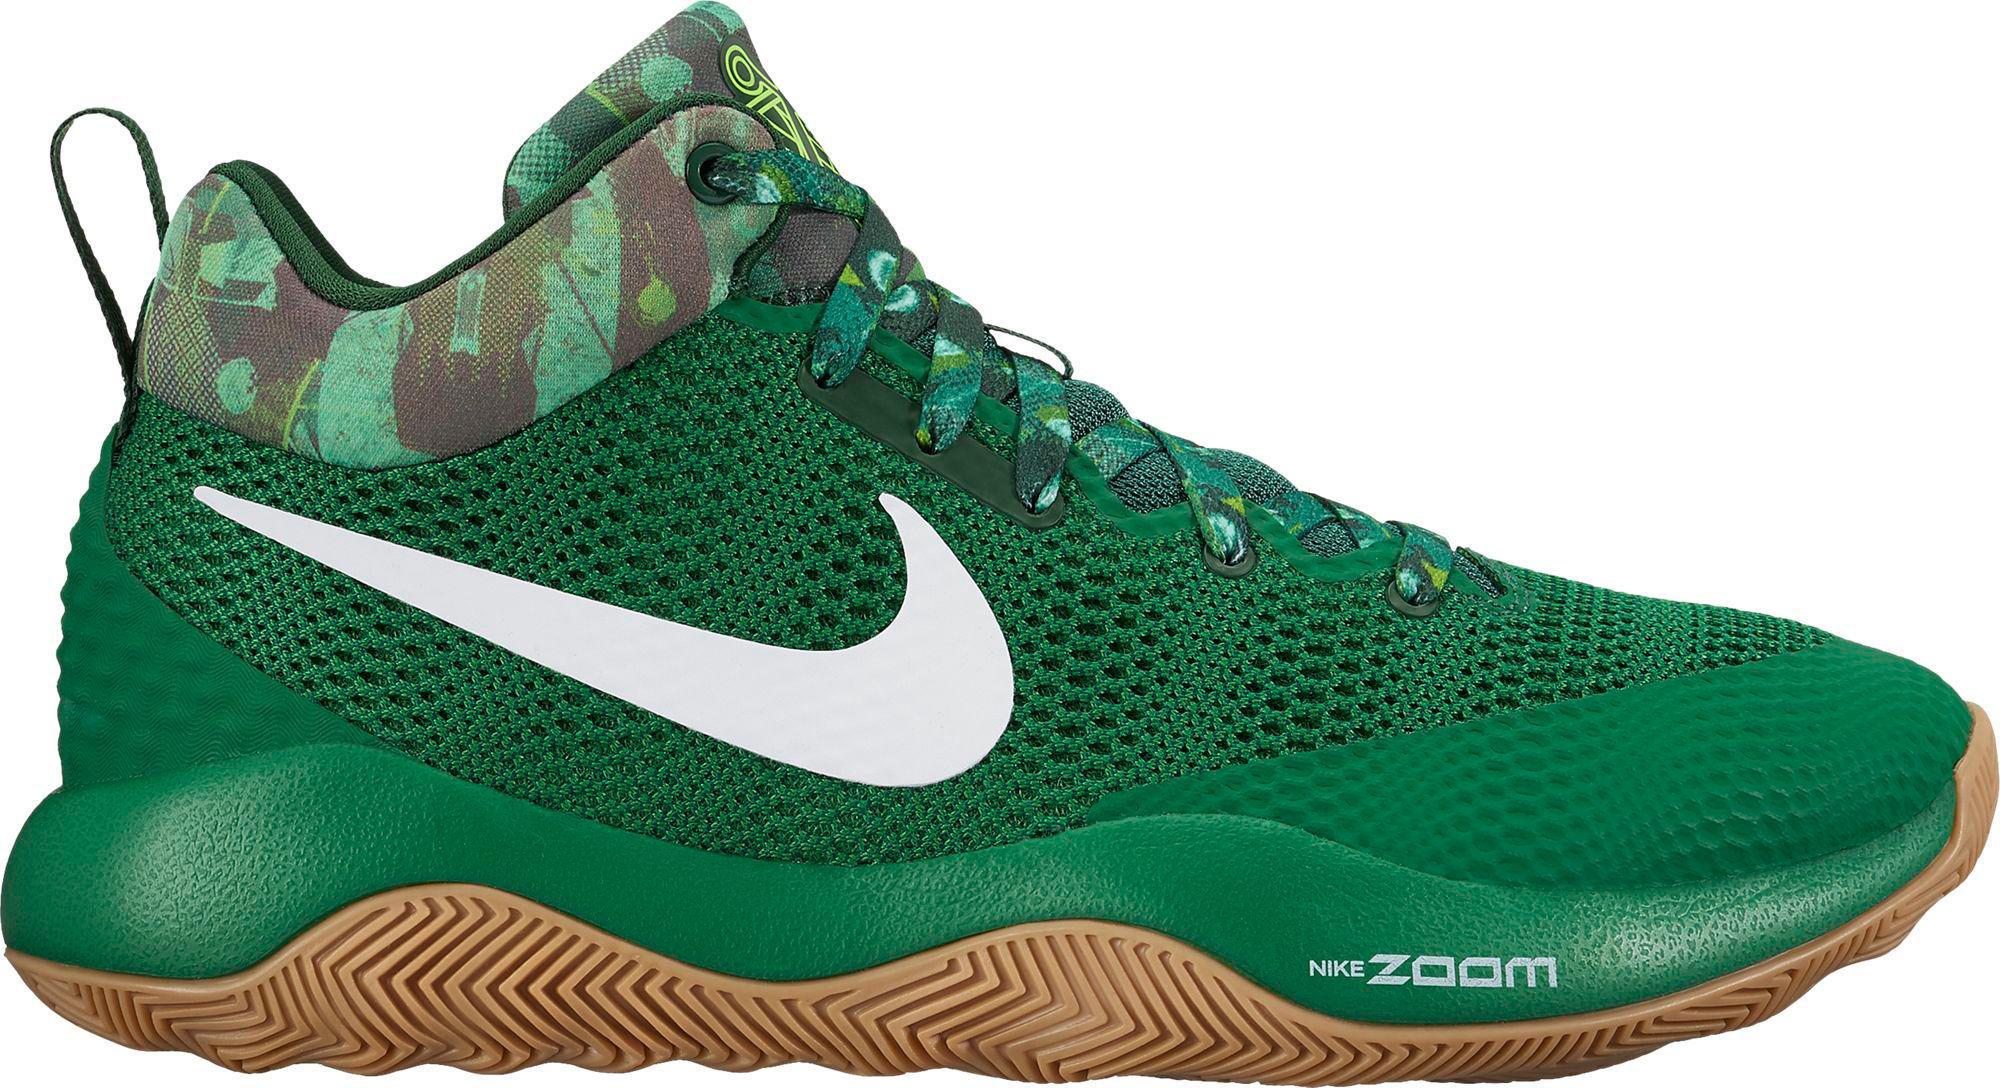 d5425b7af601 Lyst - Nike Zoom Rev 2017 Basketball Shoes in Green for Men